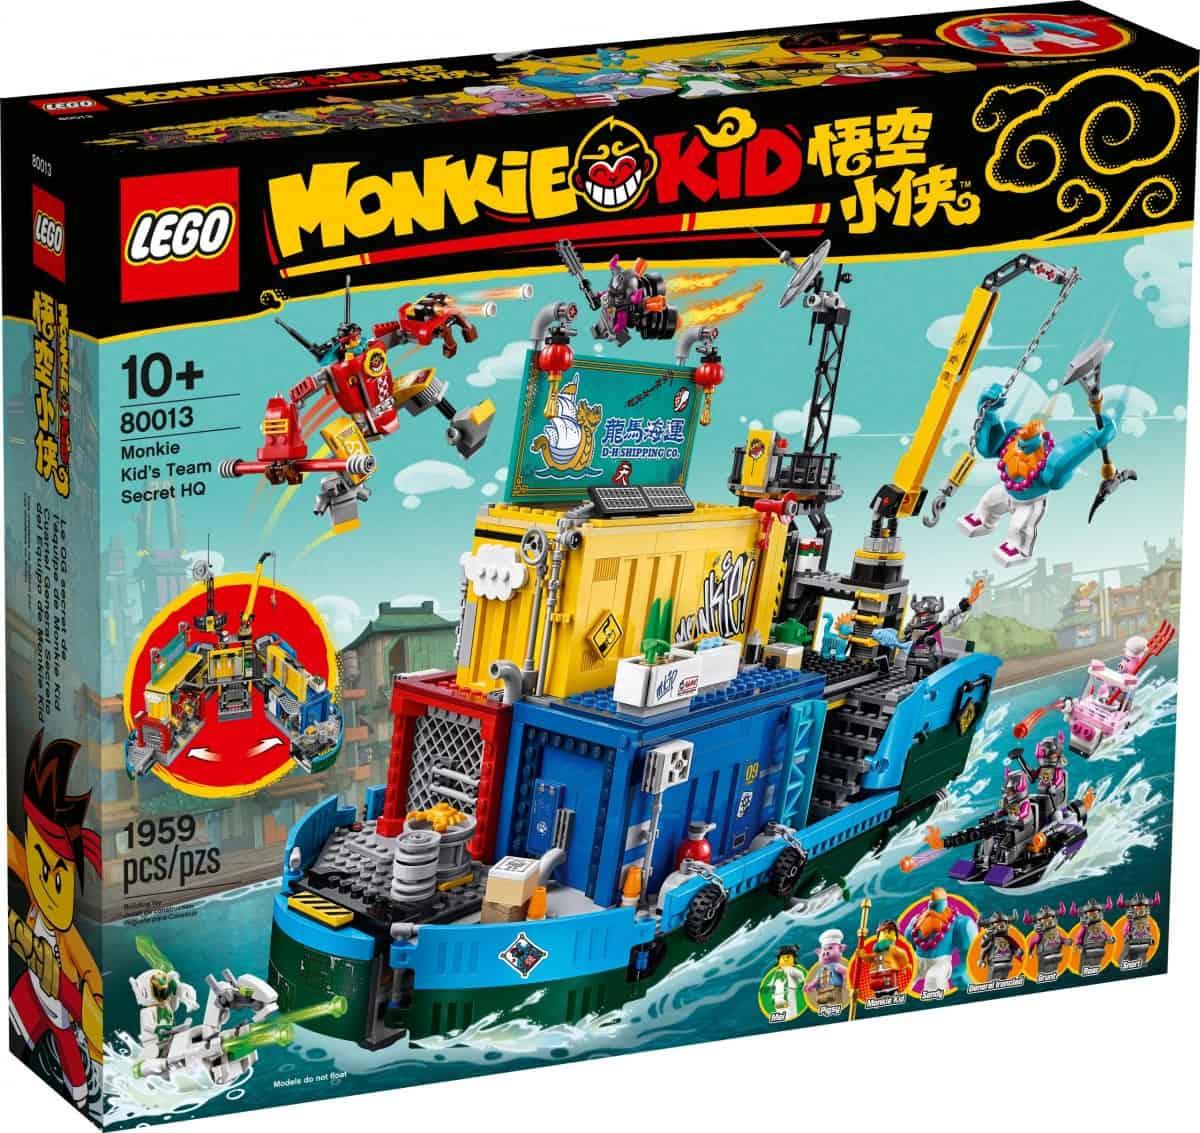 lego 80013 monkie kids team secret hq scaled